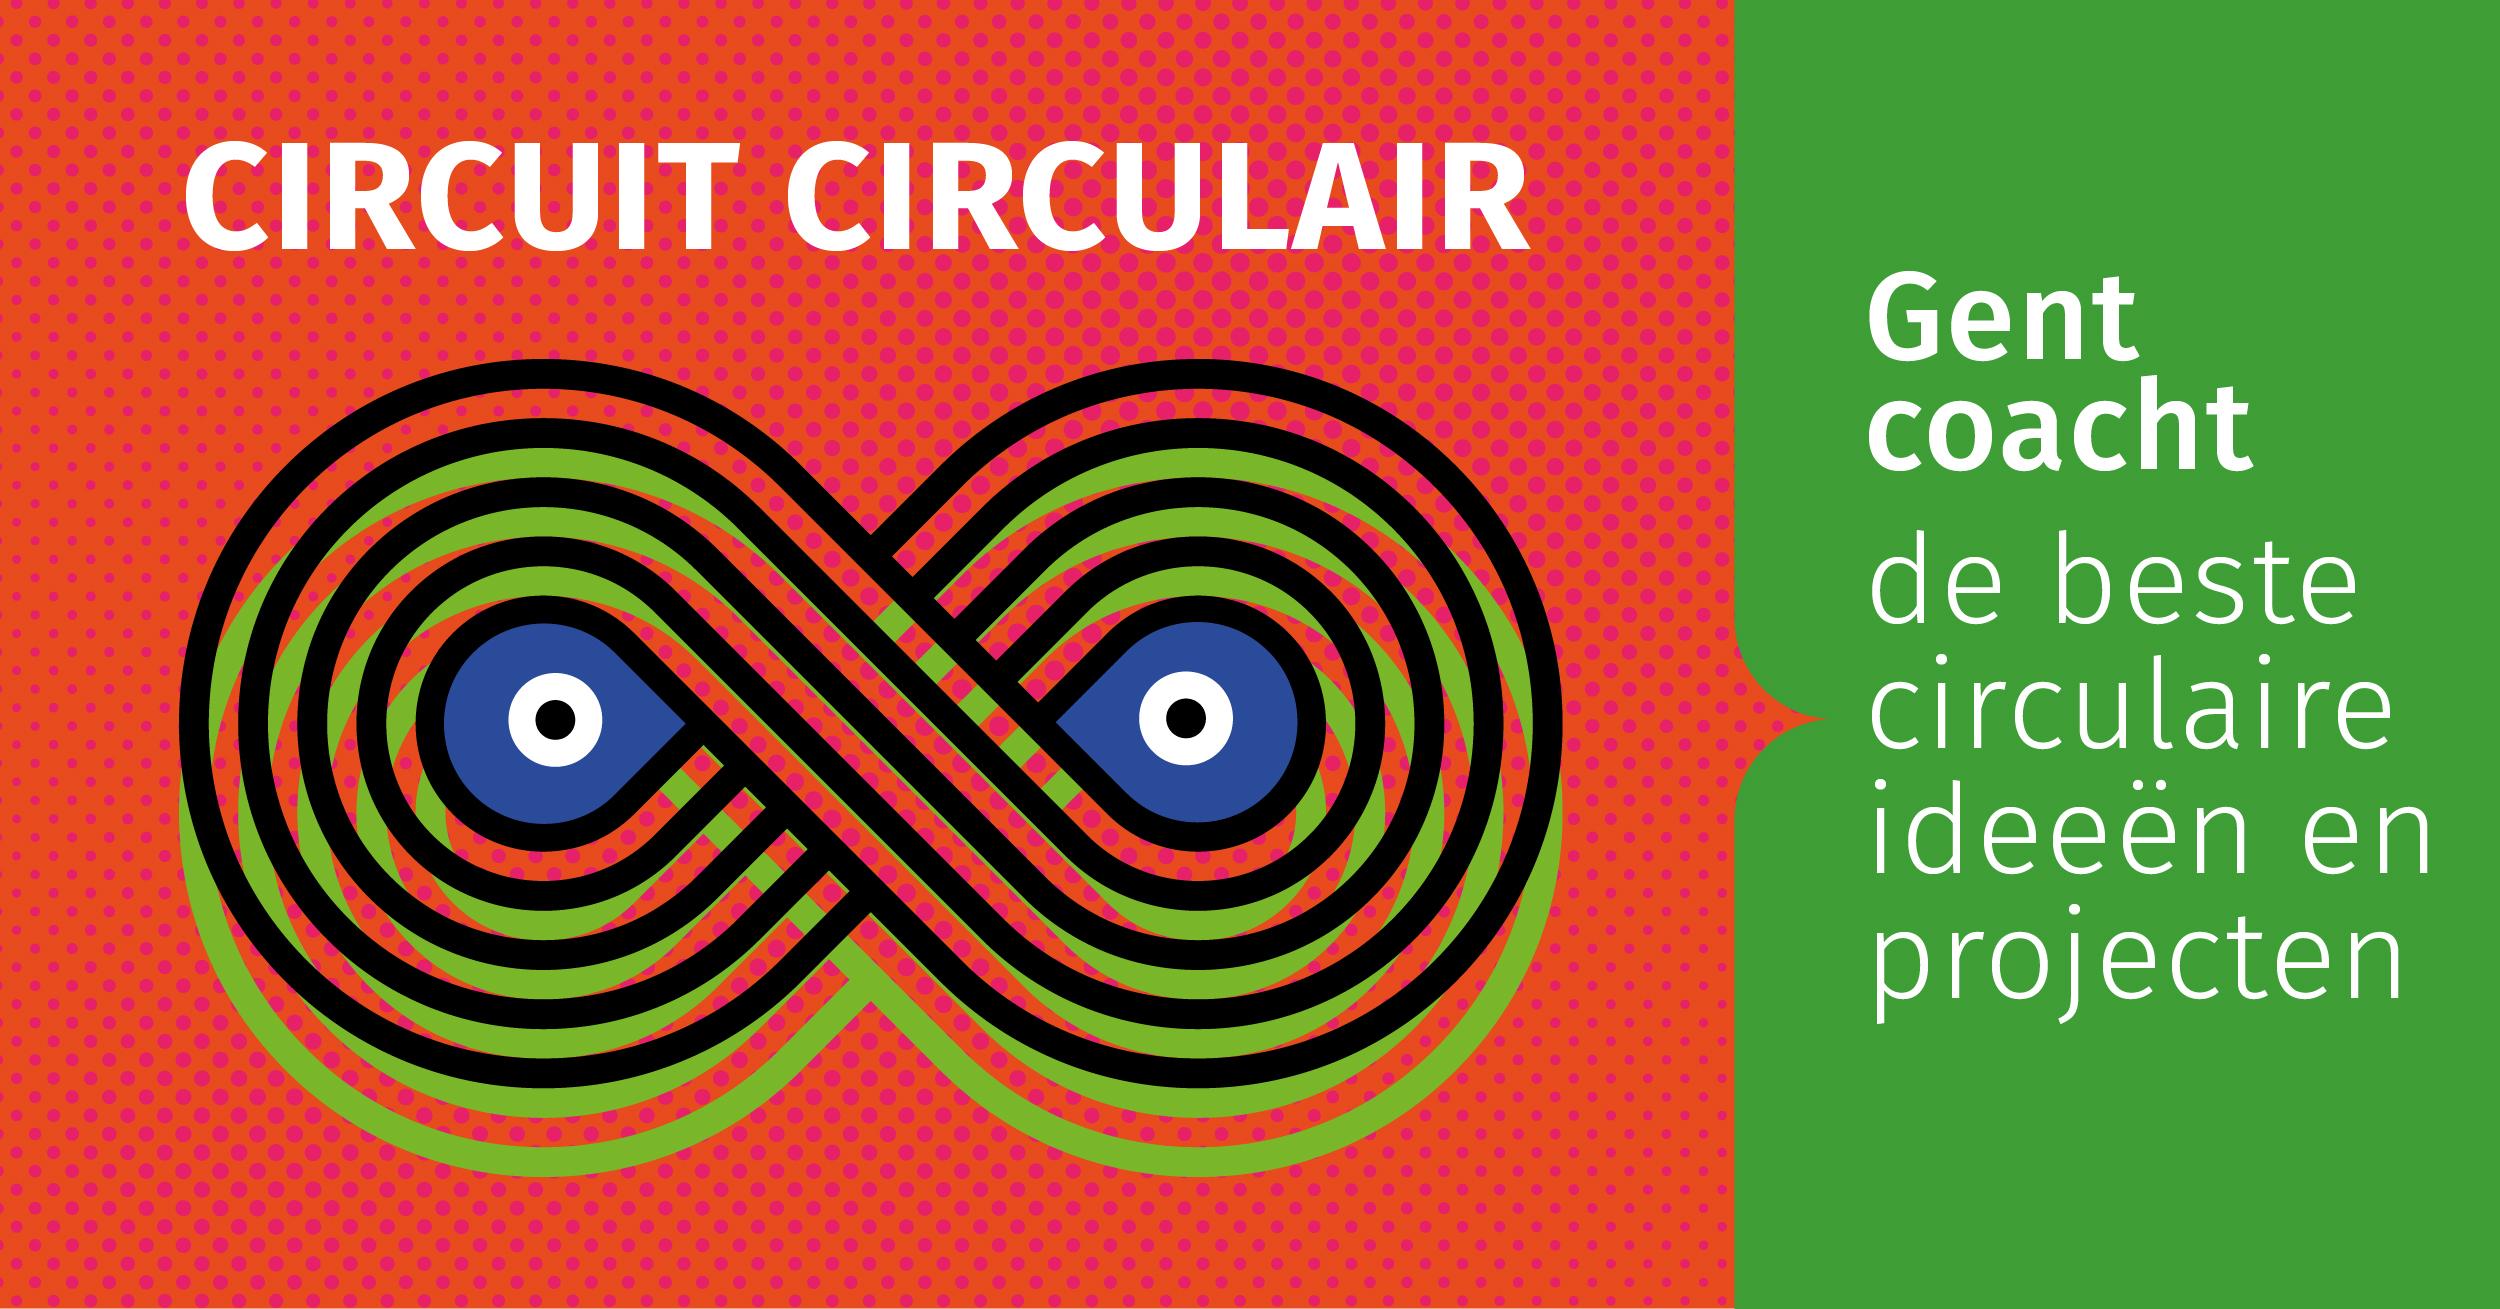 Circuit circulair social media stilstaand 1200 x 628 px.jpg